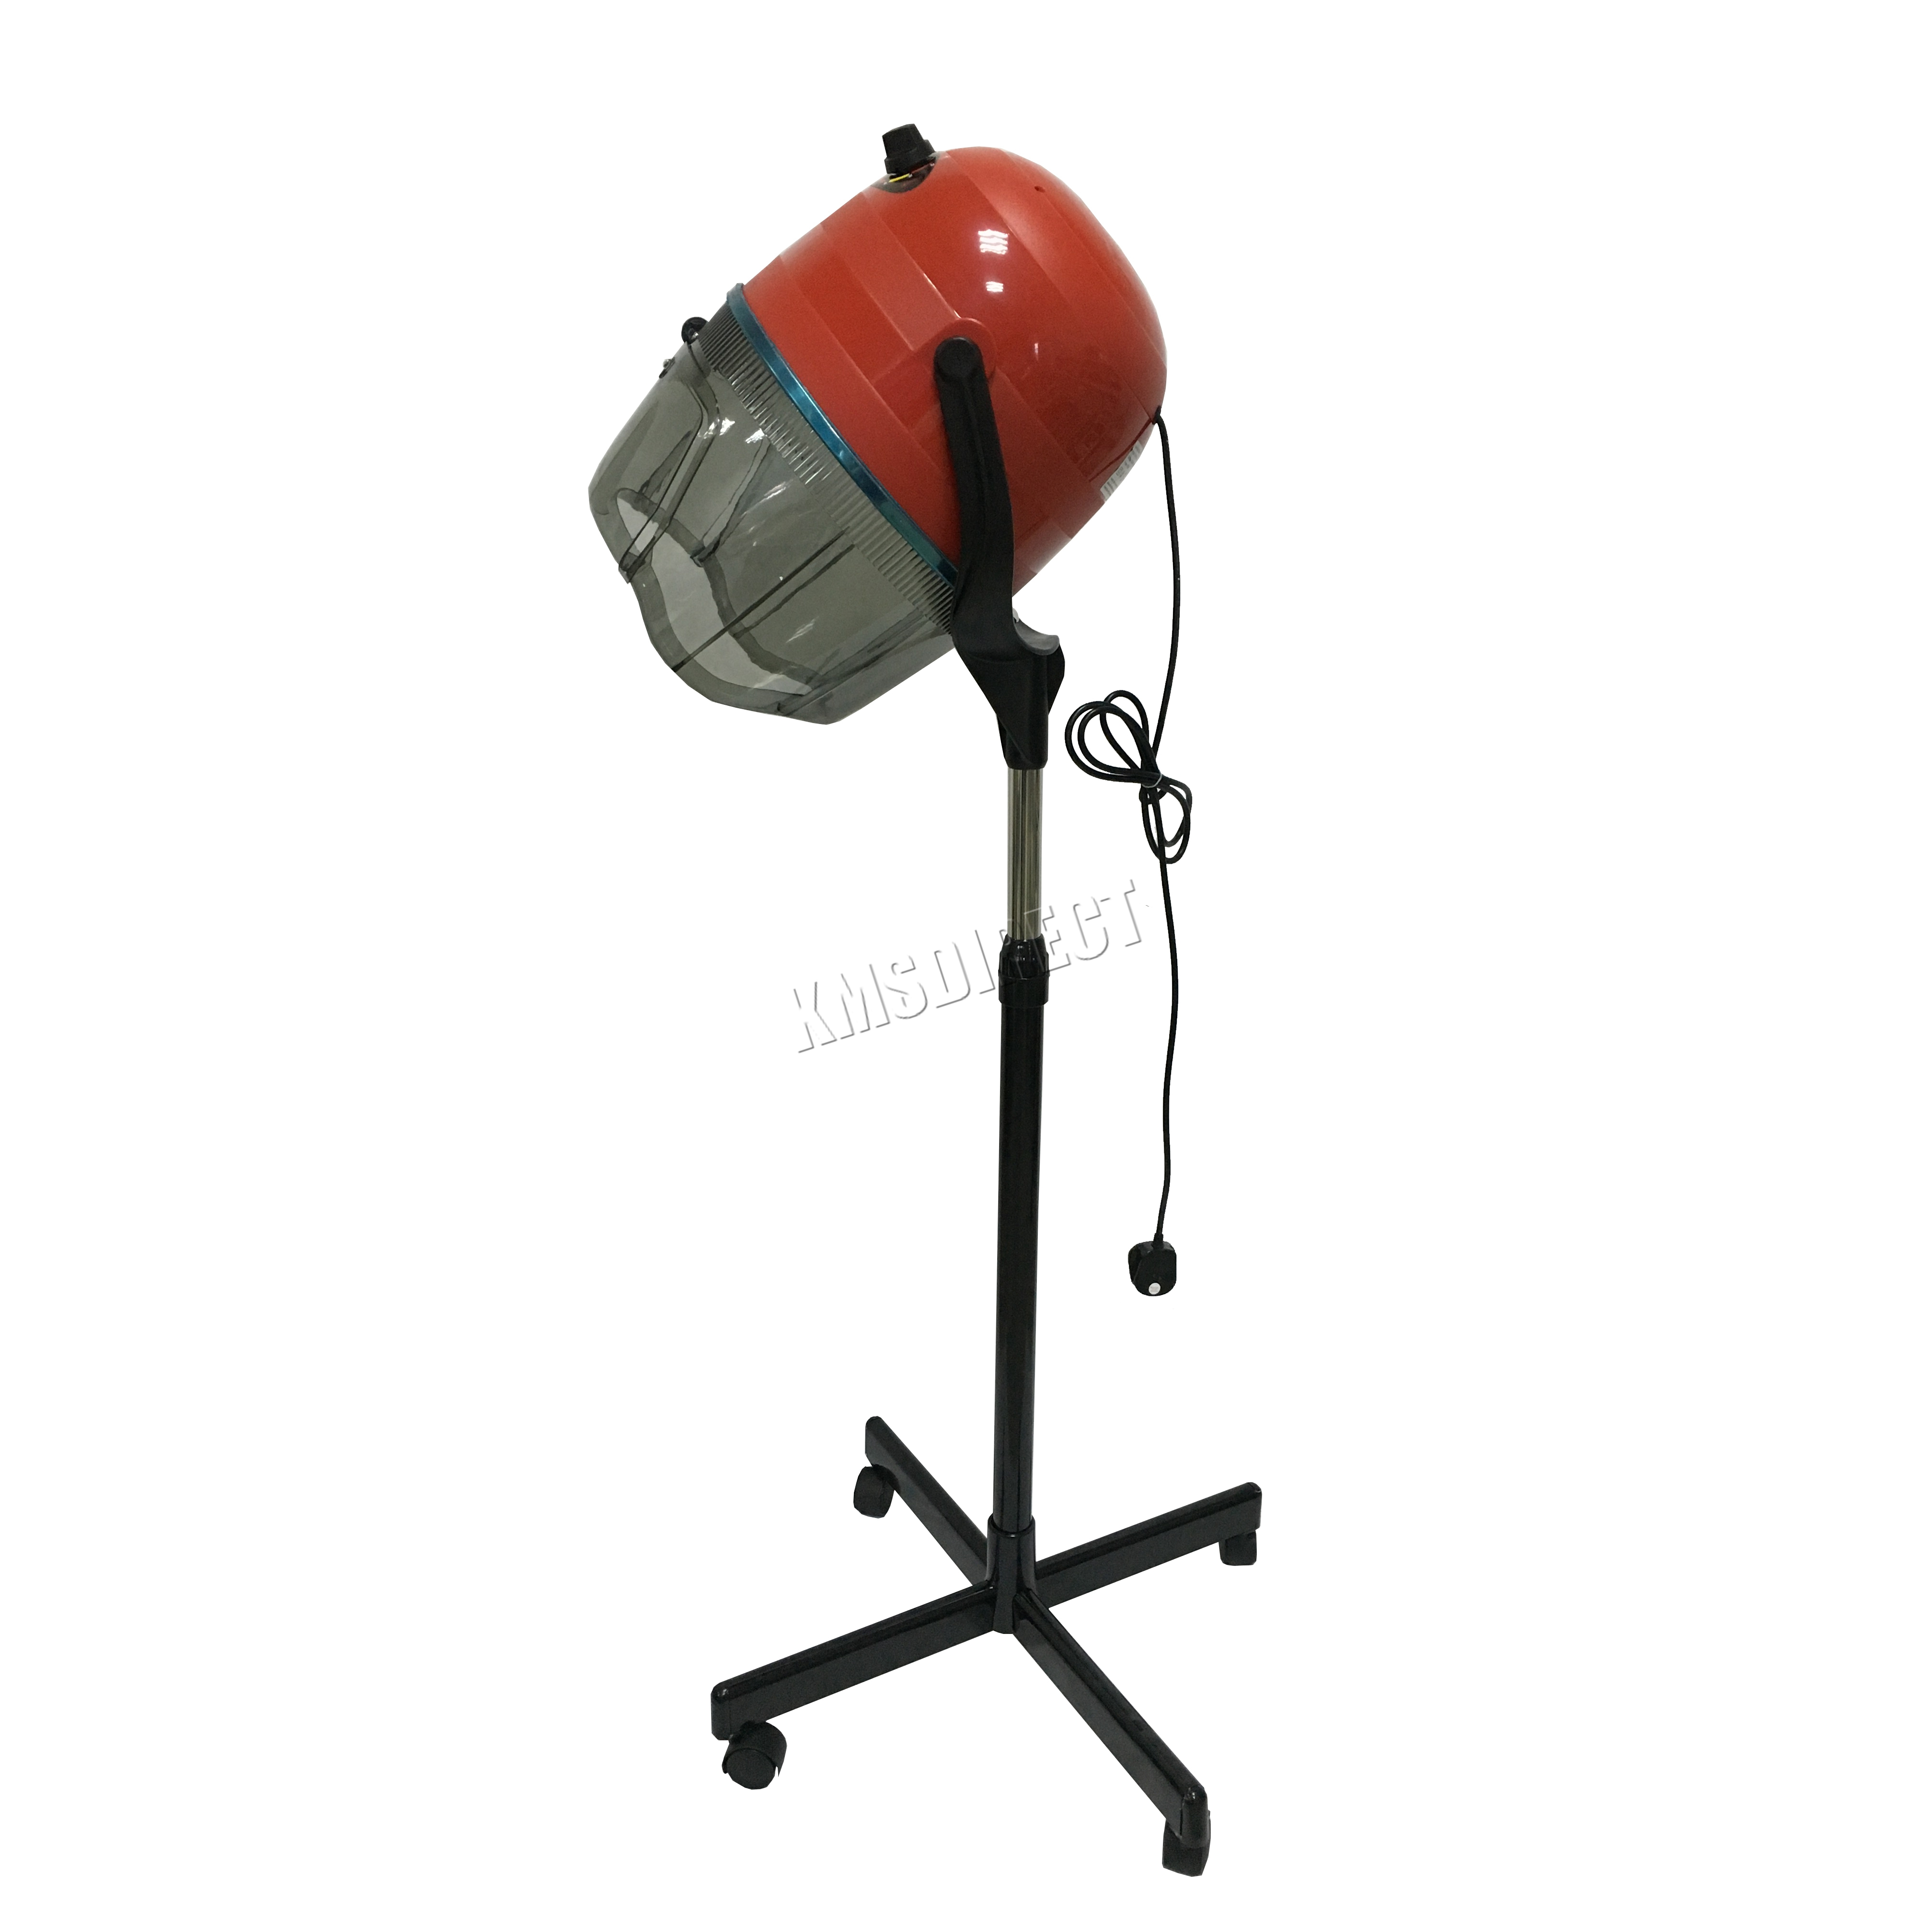 FoxHunter Portable Salon Hair Hood Dryer Stand Up